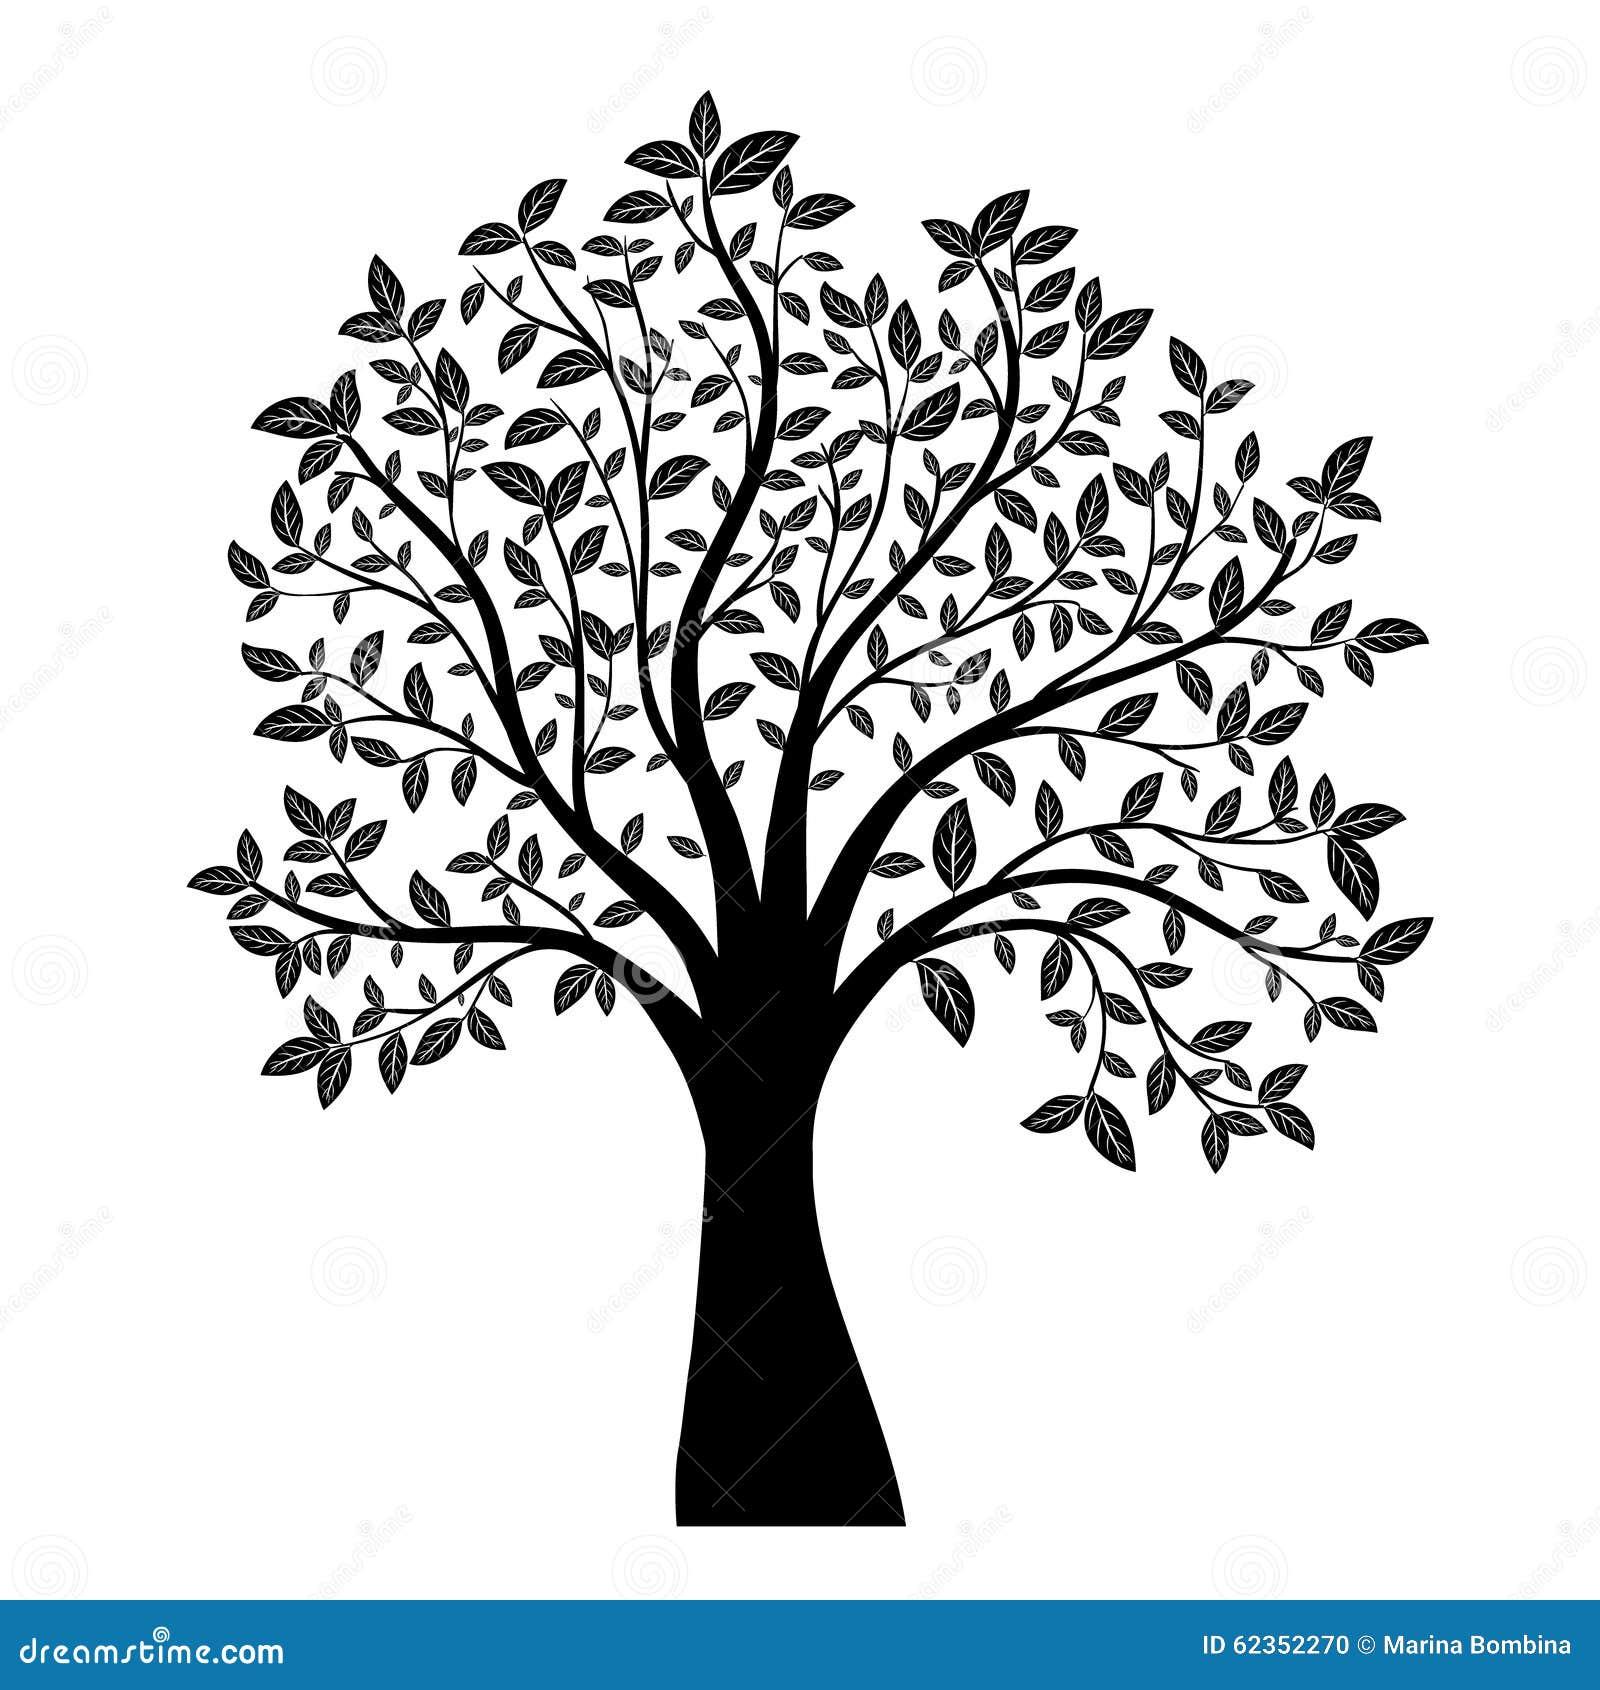 tree silhouette stock vector illustration of icon